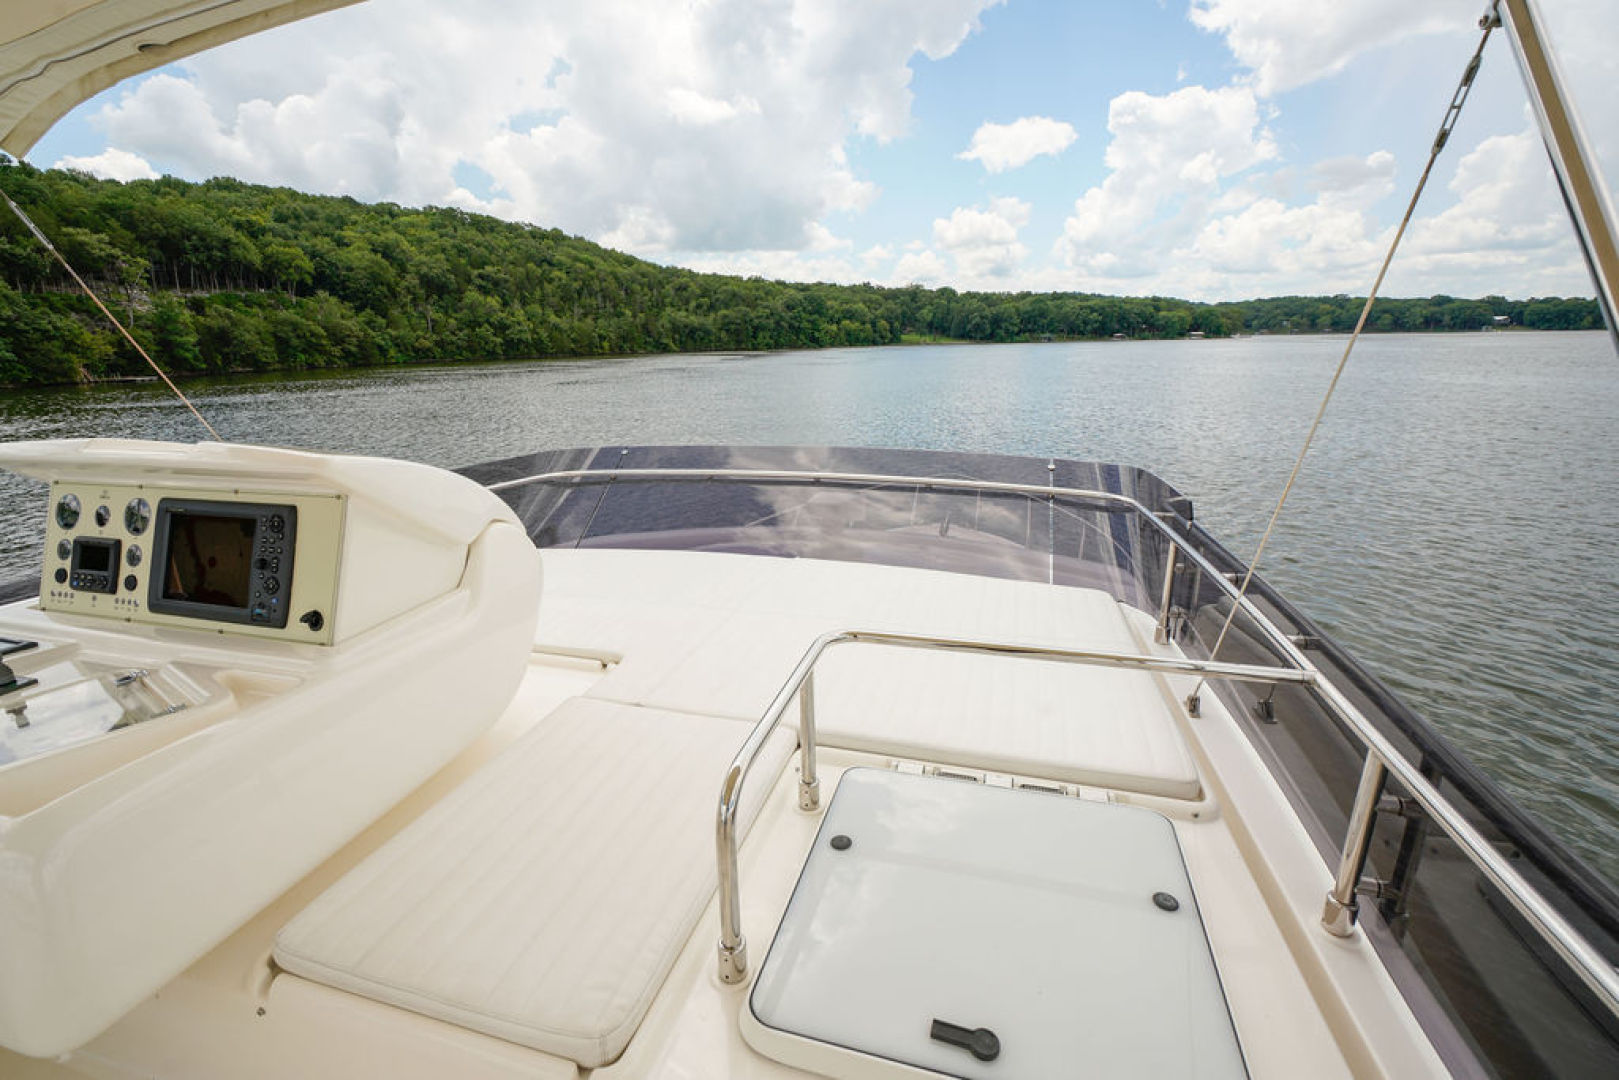 Ferretti Yachts-530 2013-ISLAND GIRL Mount Juliet-Tennessee-United States-1574684   Thumbnail